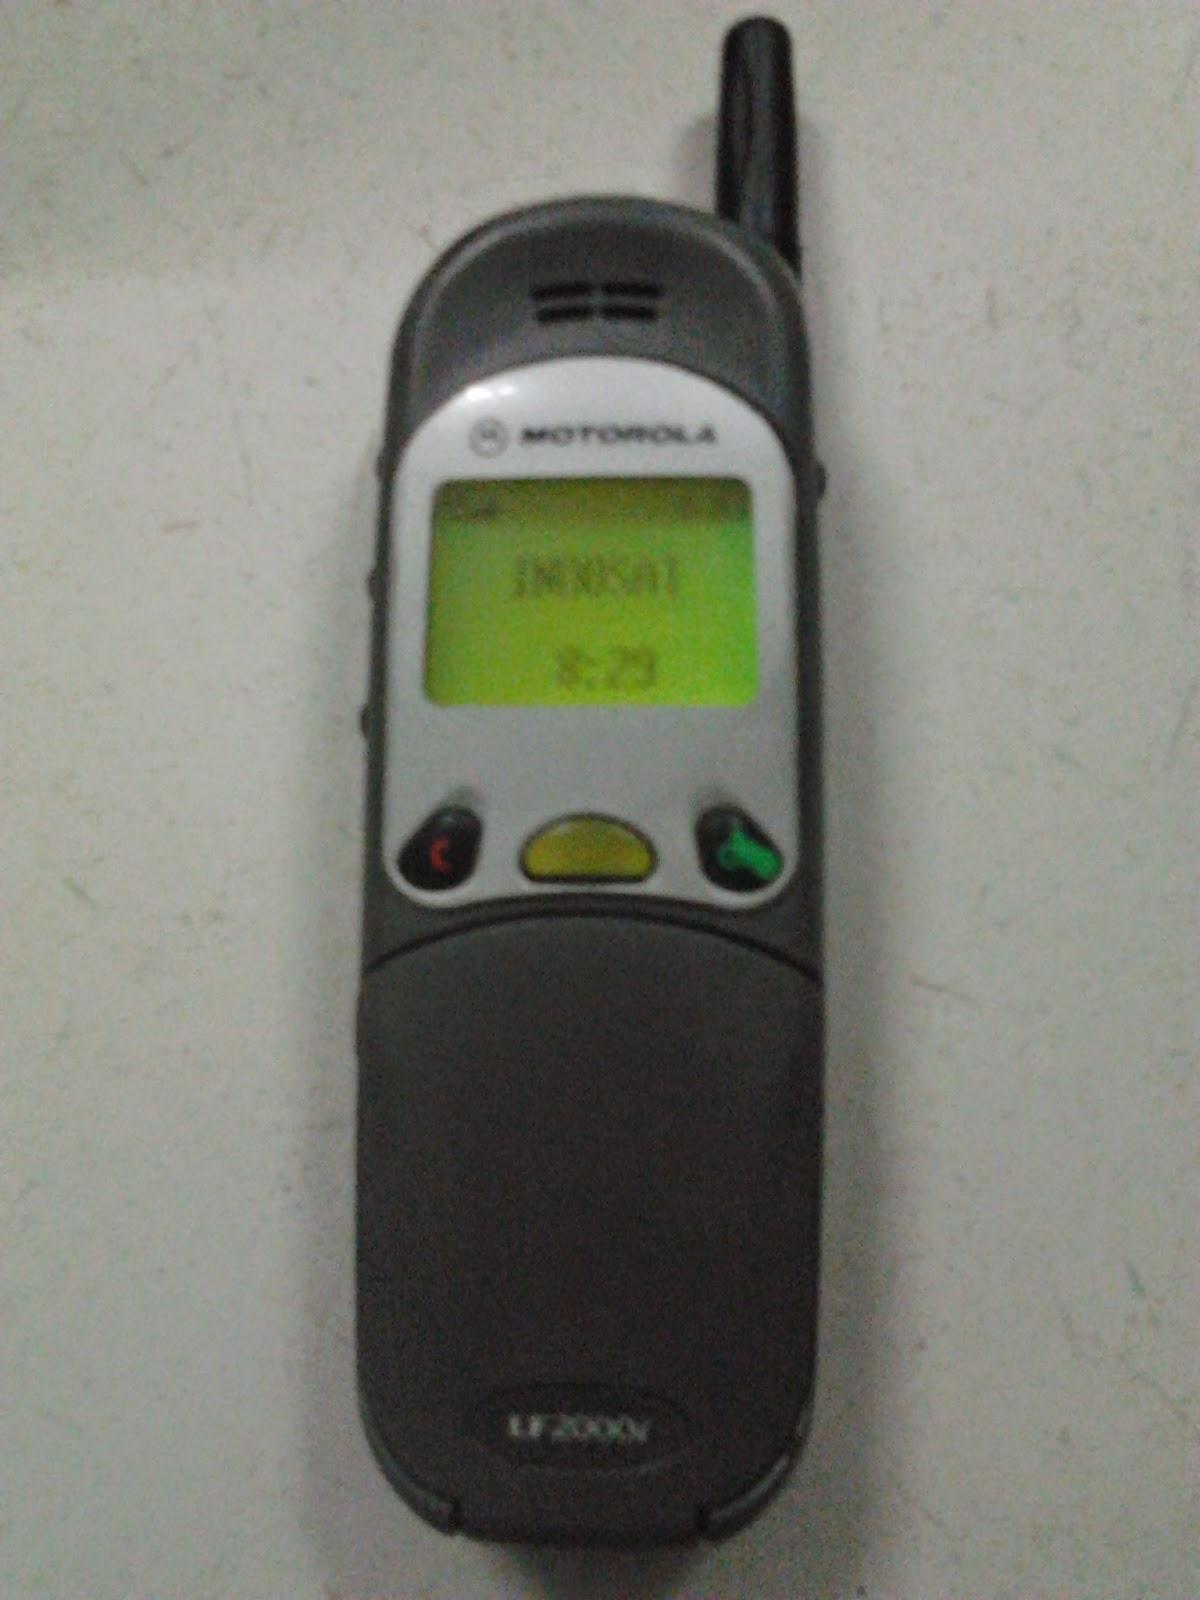 Motorola LF2000i